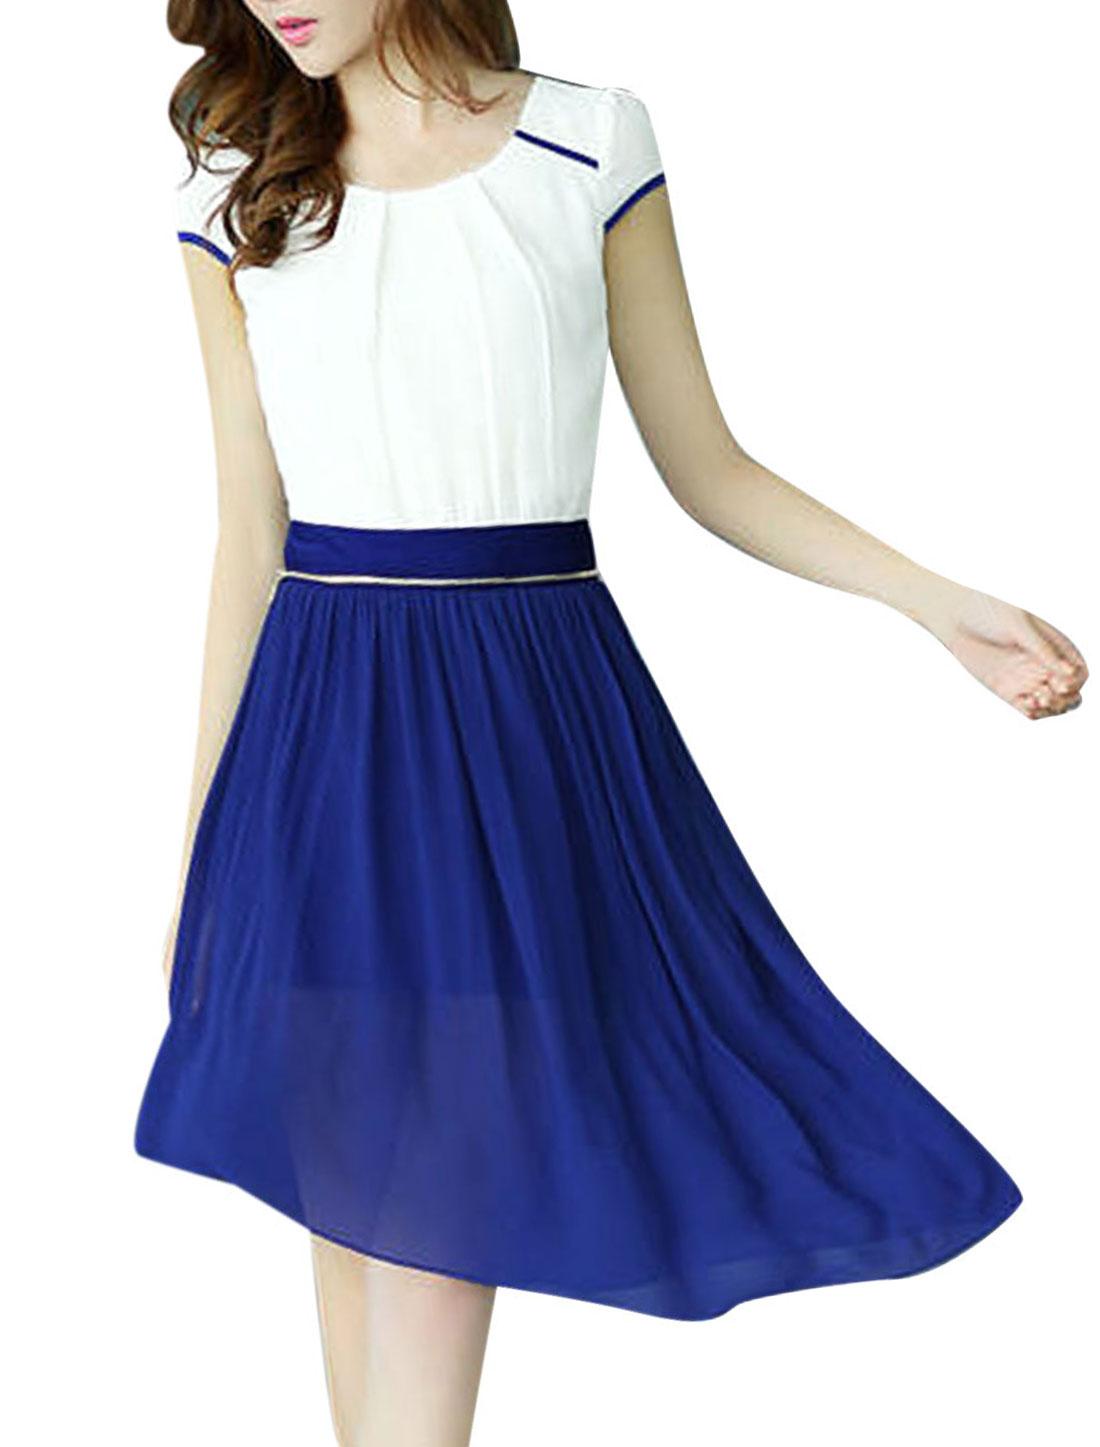 Women NEW Conceal Zipper Side Irregular Hem Royalblue White Dress XS